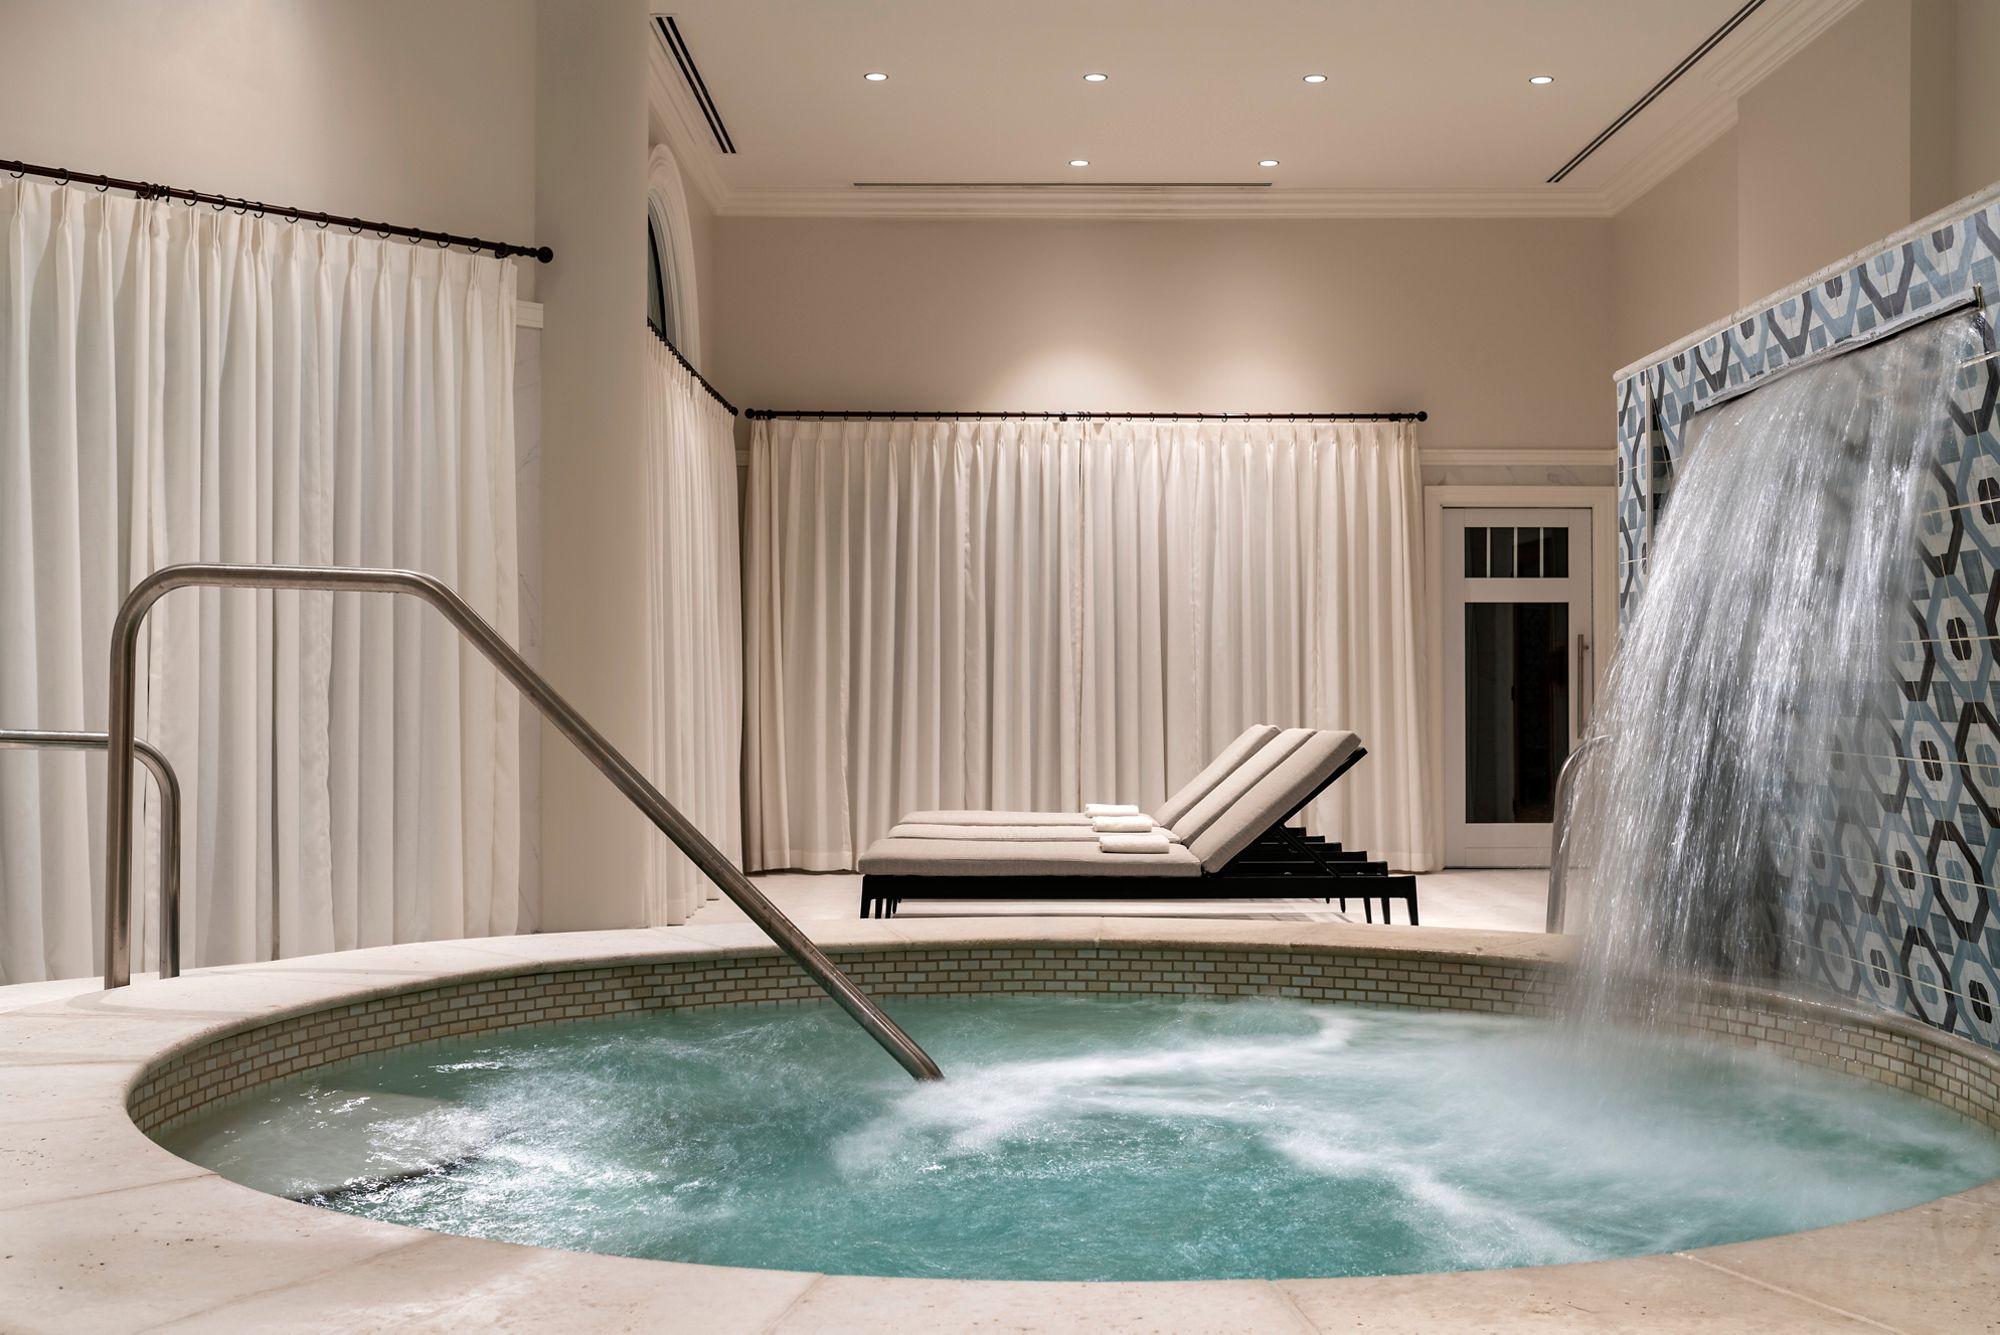 Naples Florida Resort & Spa | The Ritz-Carlton, Naples